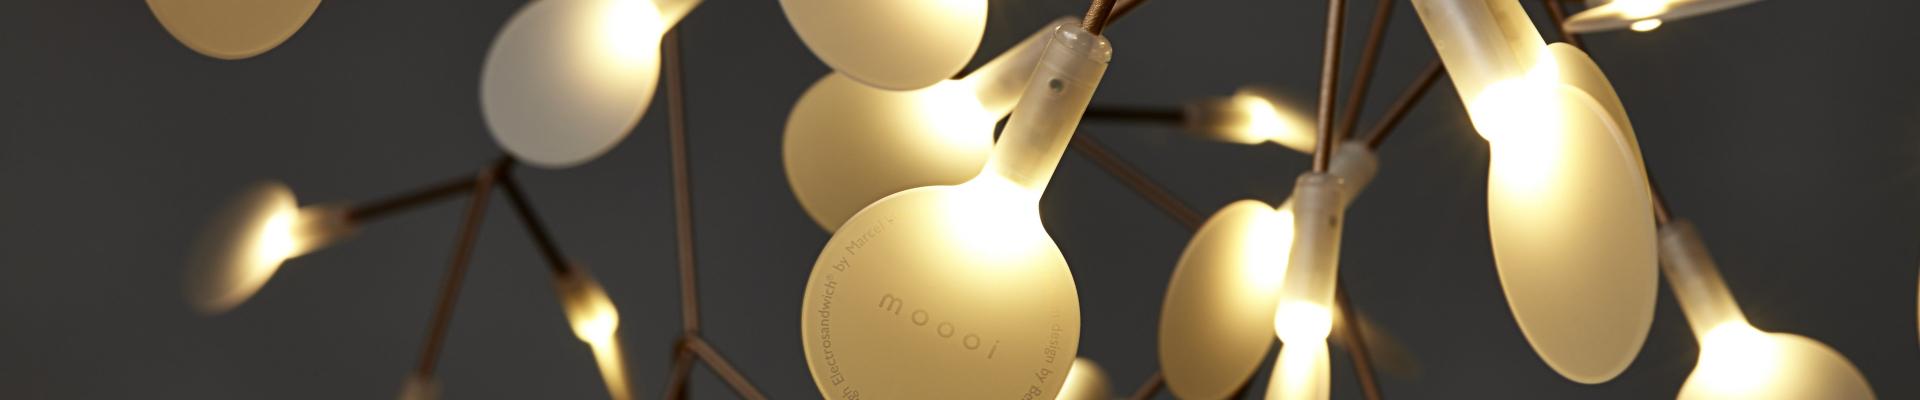 Moooi hanglampen